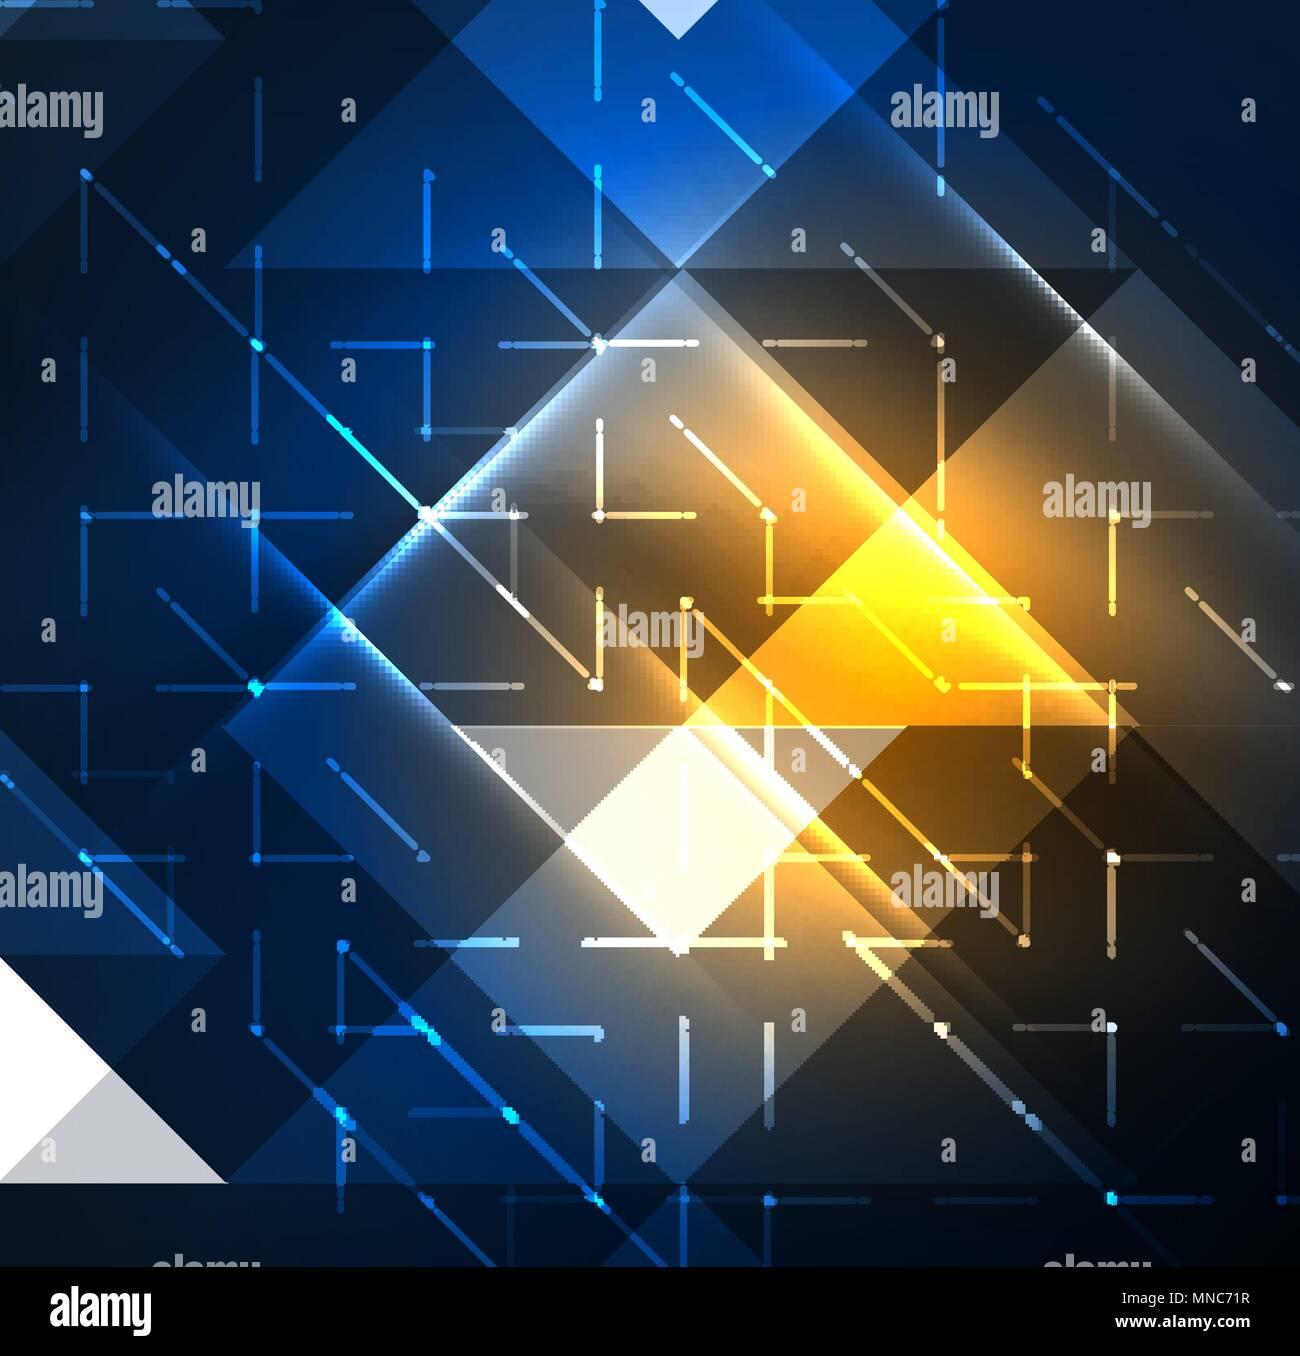 Cosmic Electric Background With Shiny Glowing Plexus